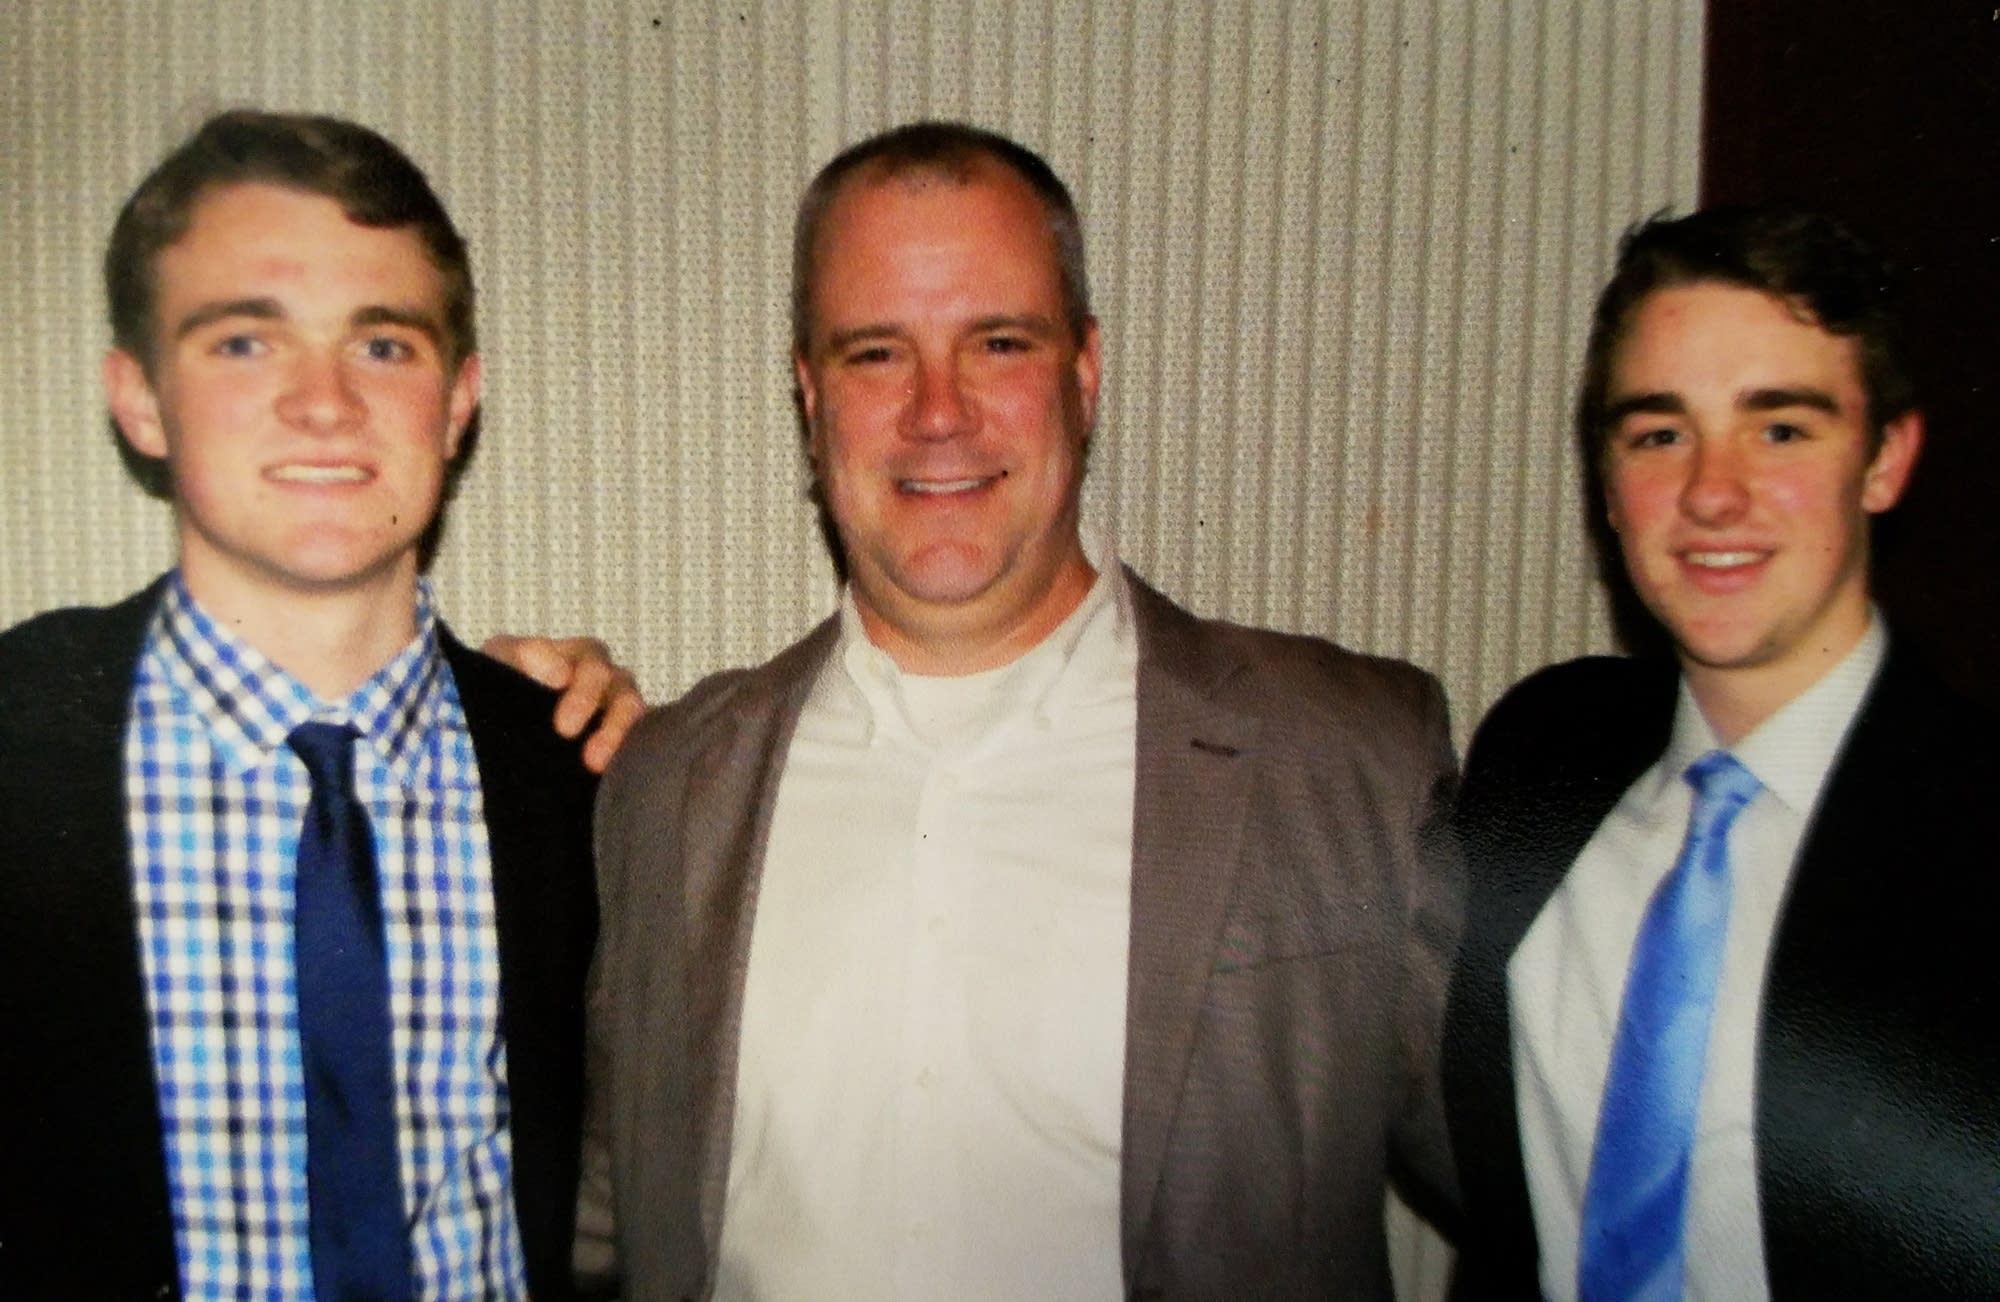 Robert, Ray, Sr., and Ray Christy, Jr., at the MSHSL hockey banquet, 2017.